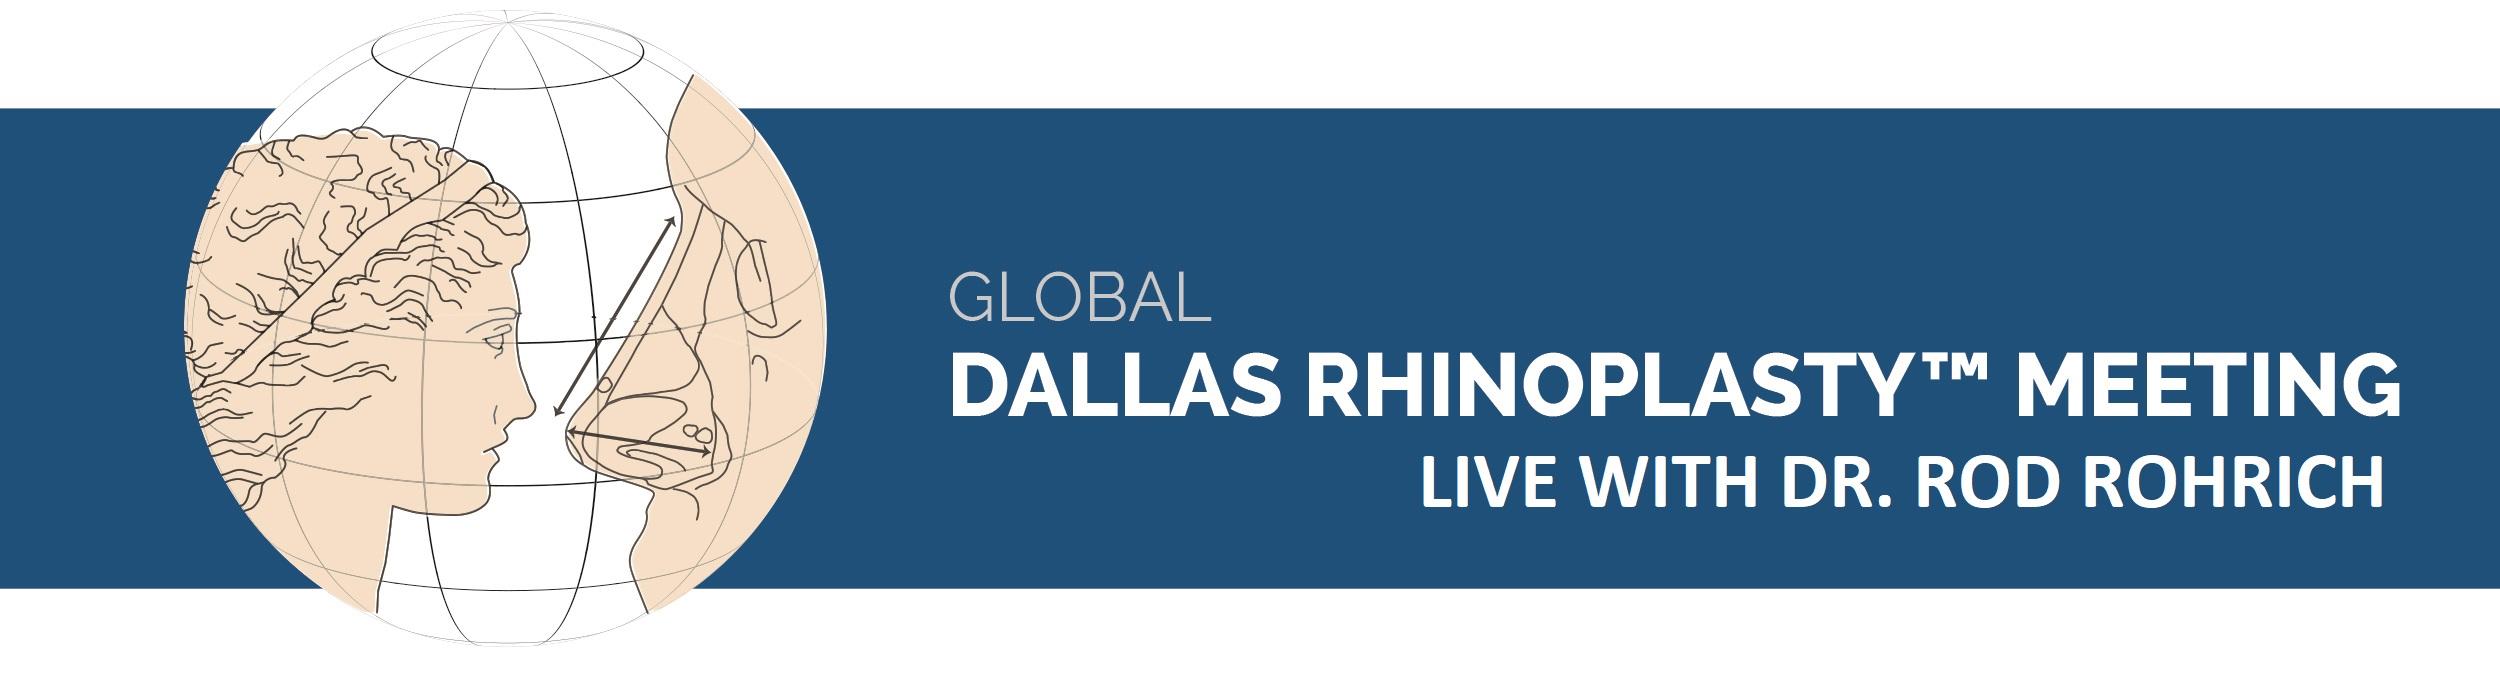 Webinar Rhino_NoTag HI RES